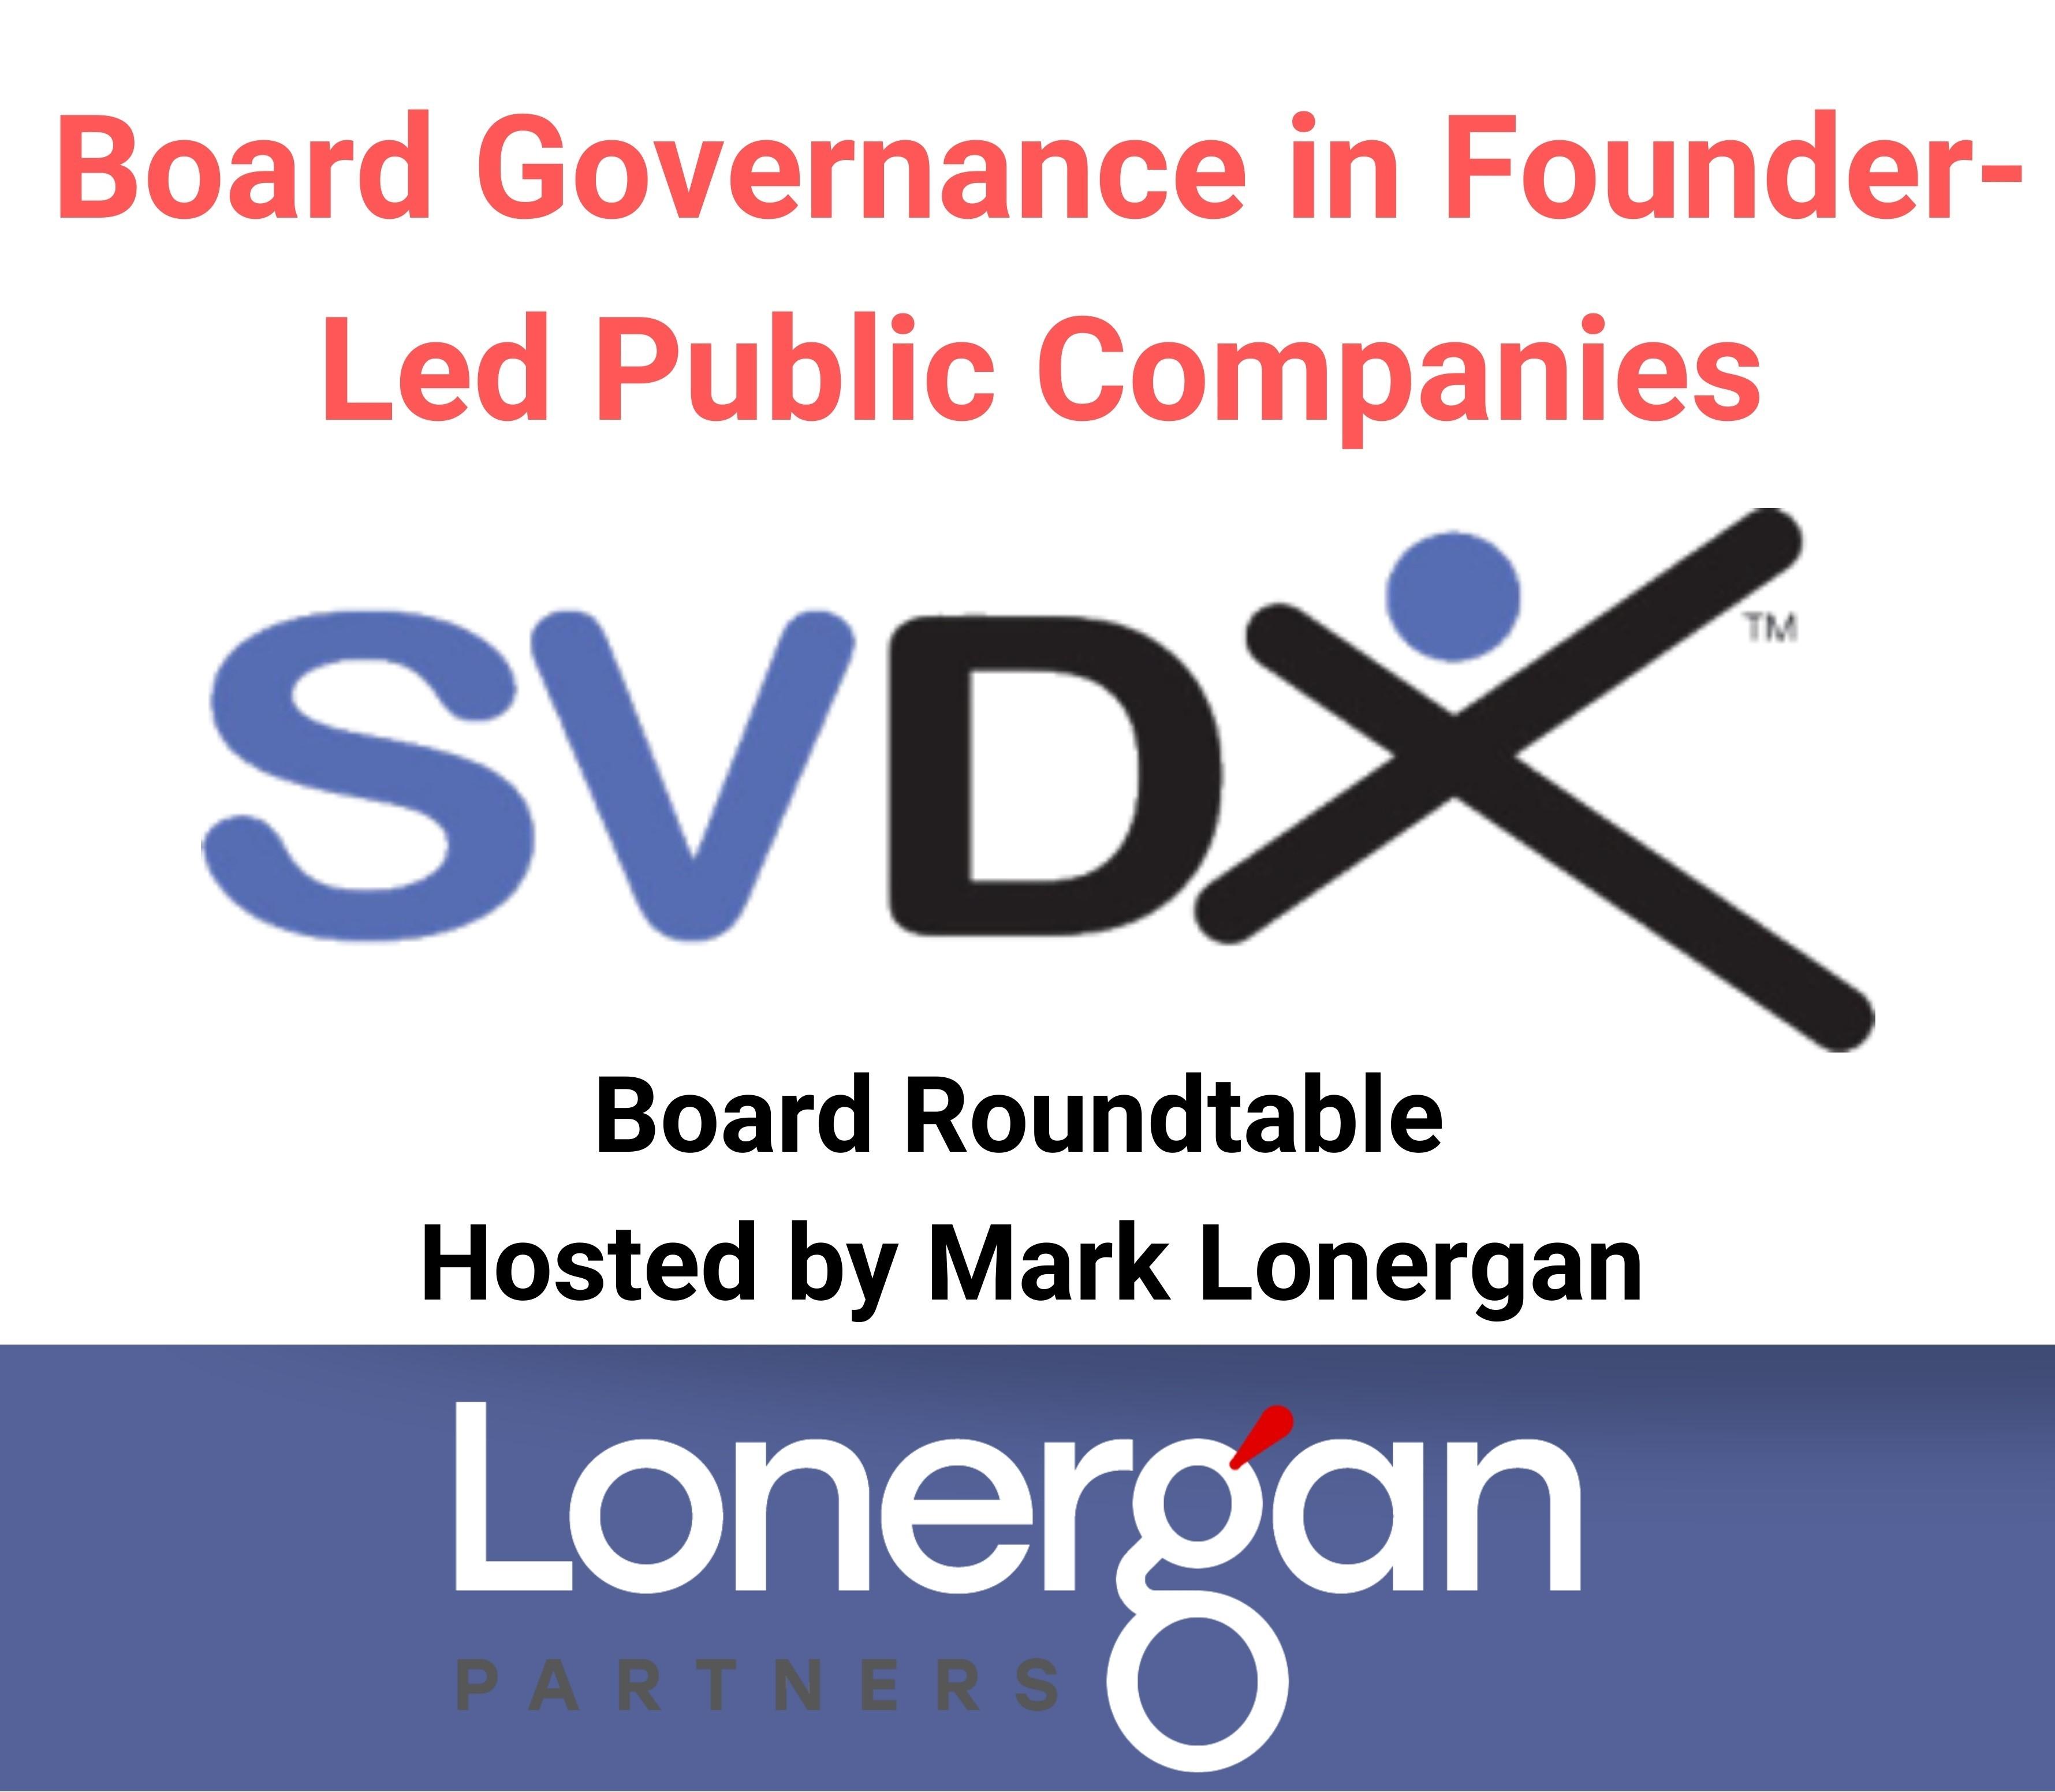 Mark Lonergan Moderates SVDX Panel on Board Governance in Founder-led Public Companies Thumbnail Image